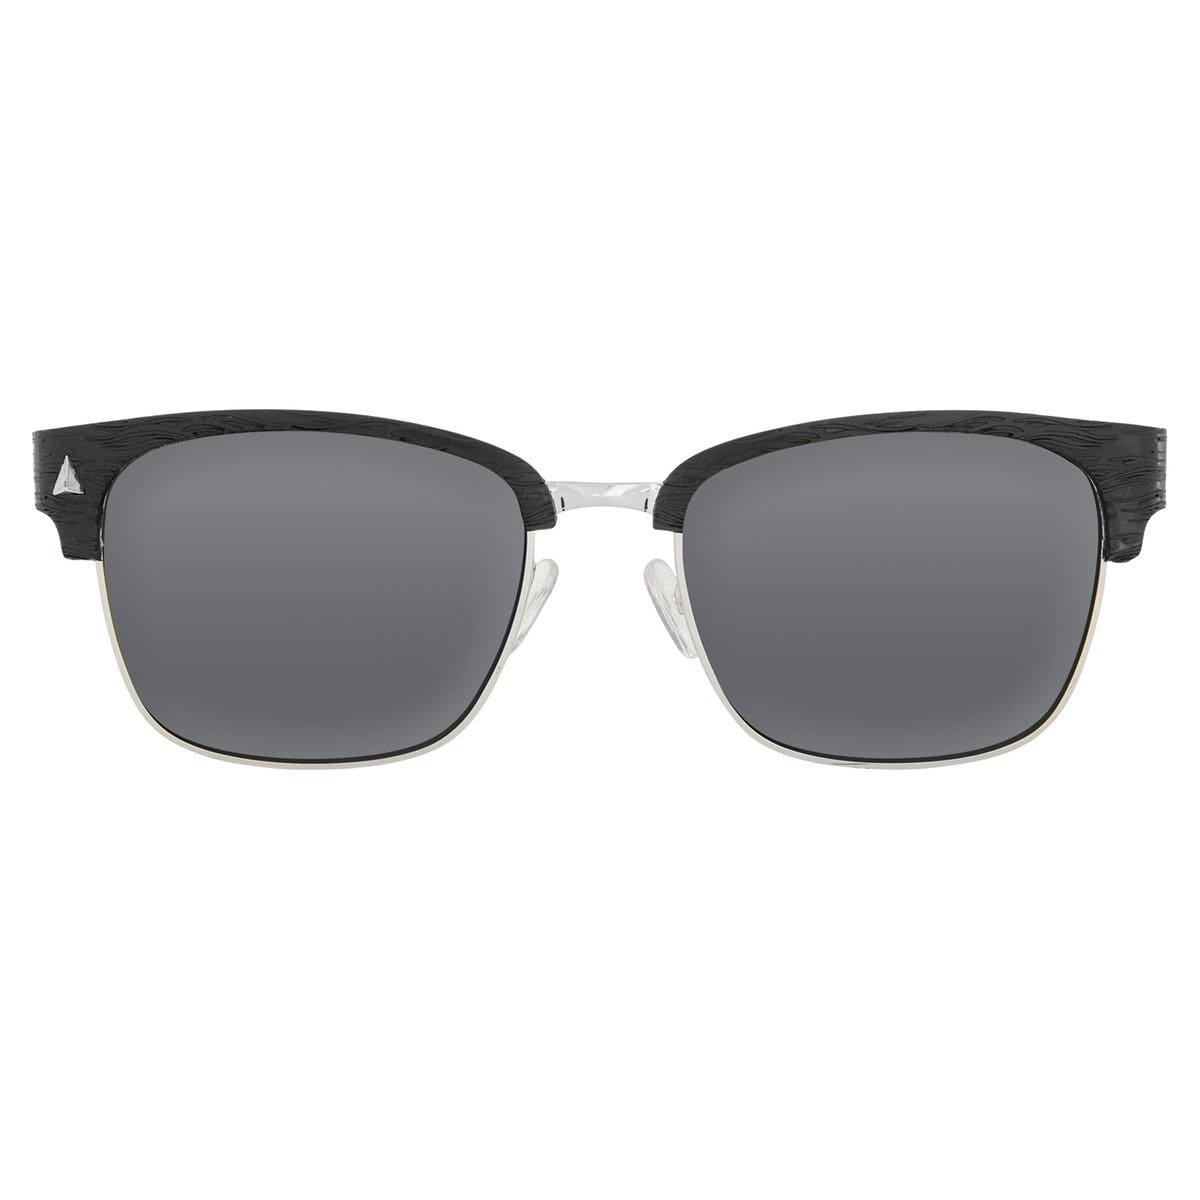 Norton Point Current Sunglasses